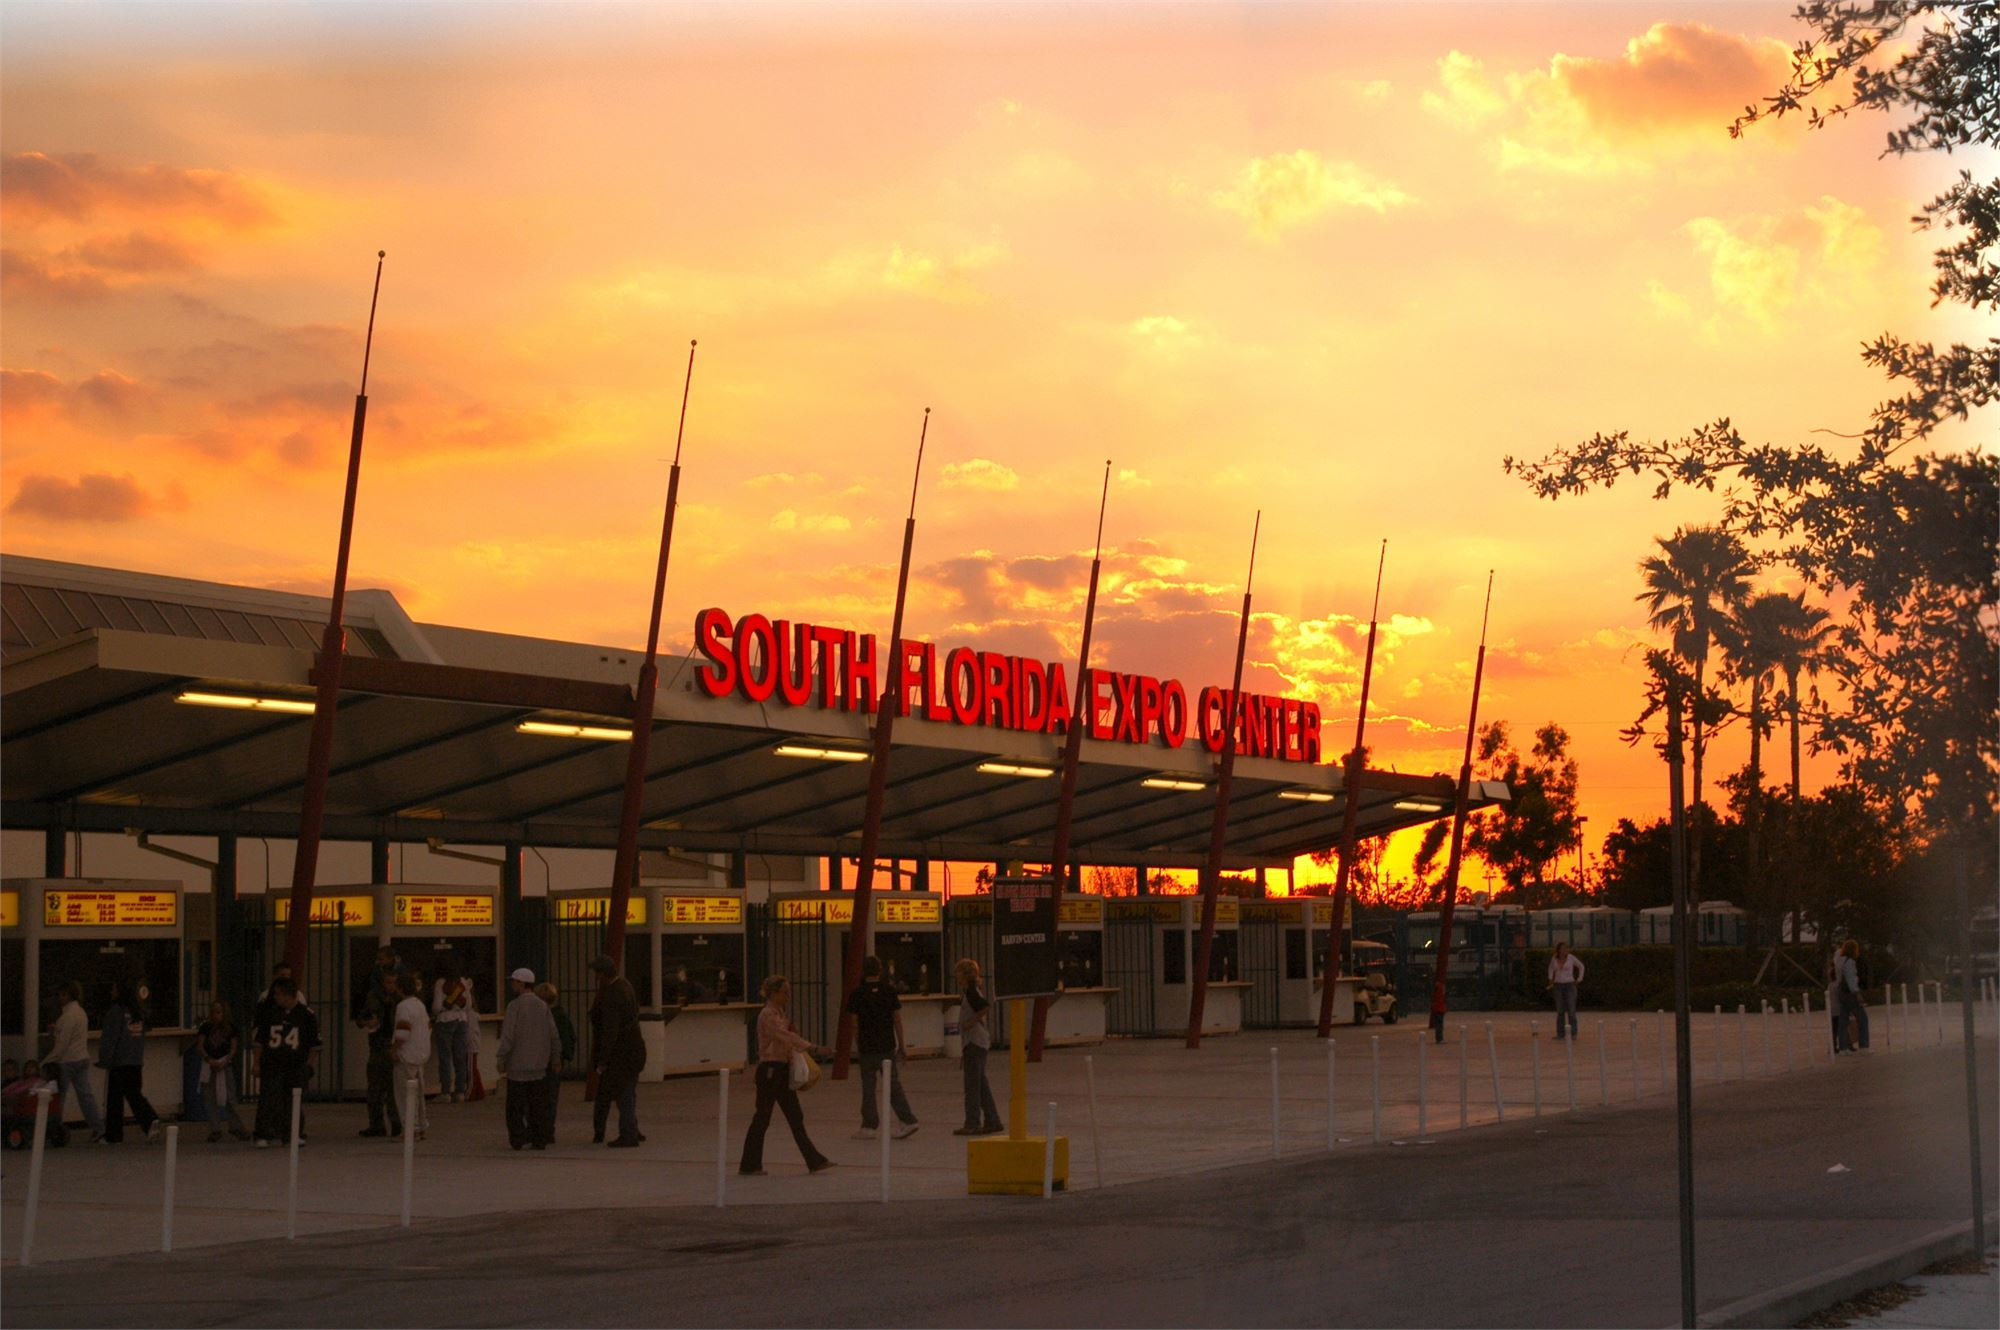 Expo Center At The South Florida Fairgrounds inside South Florida Fairgrounds Schedule